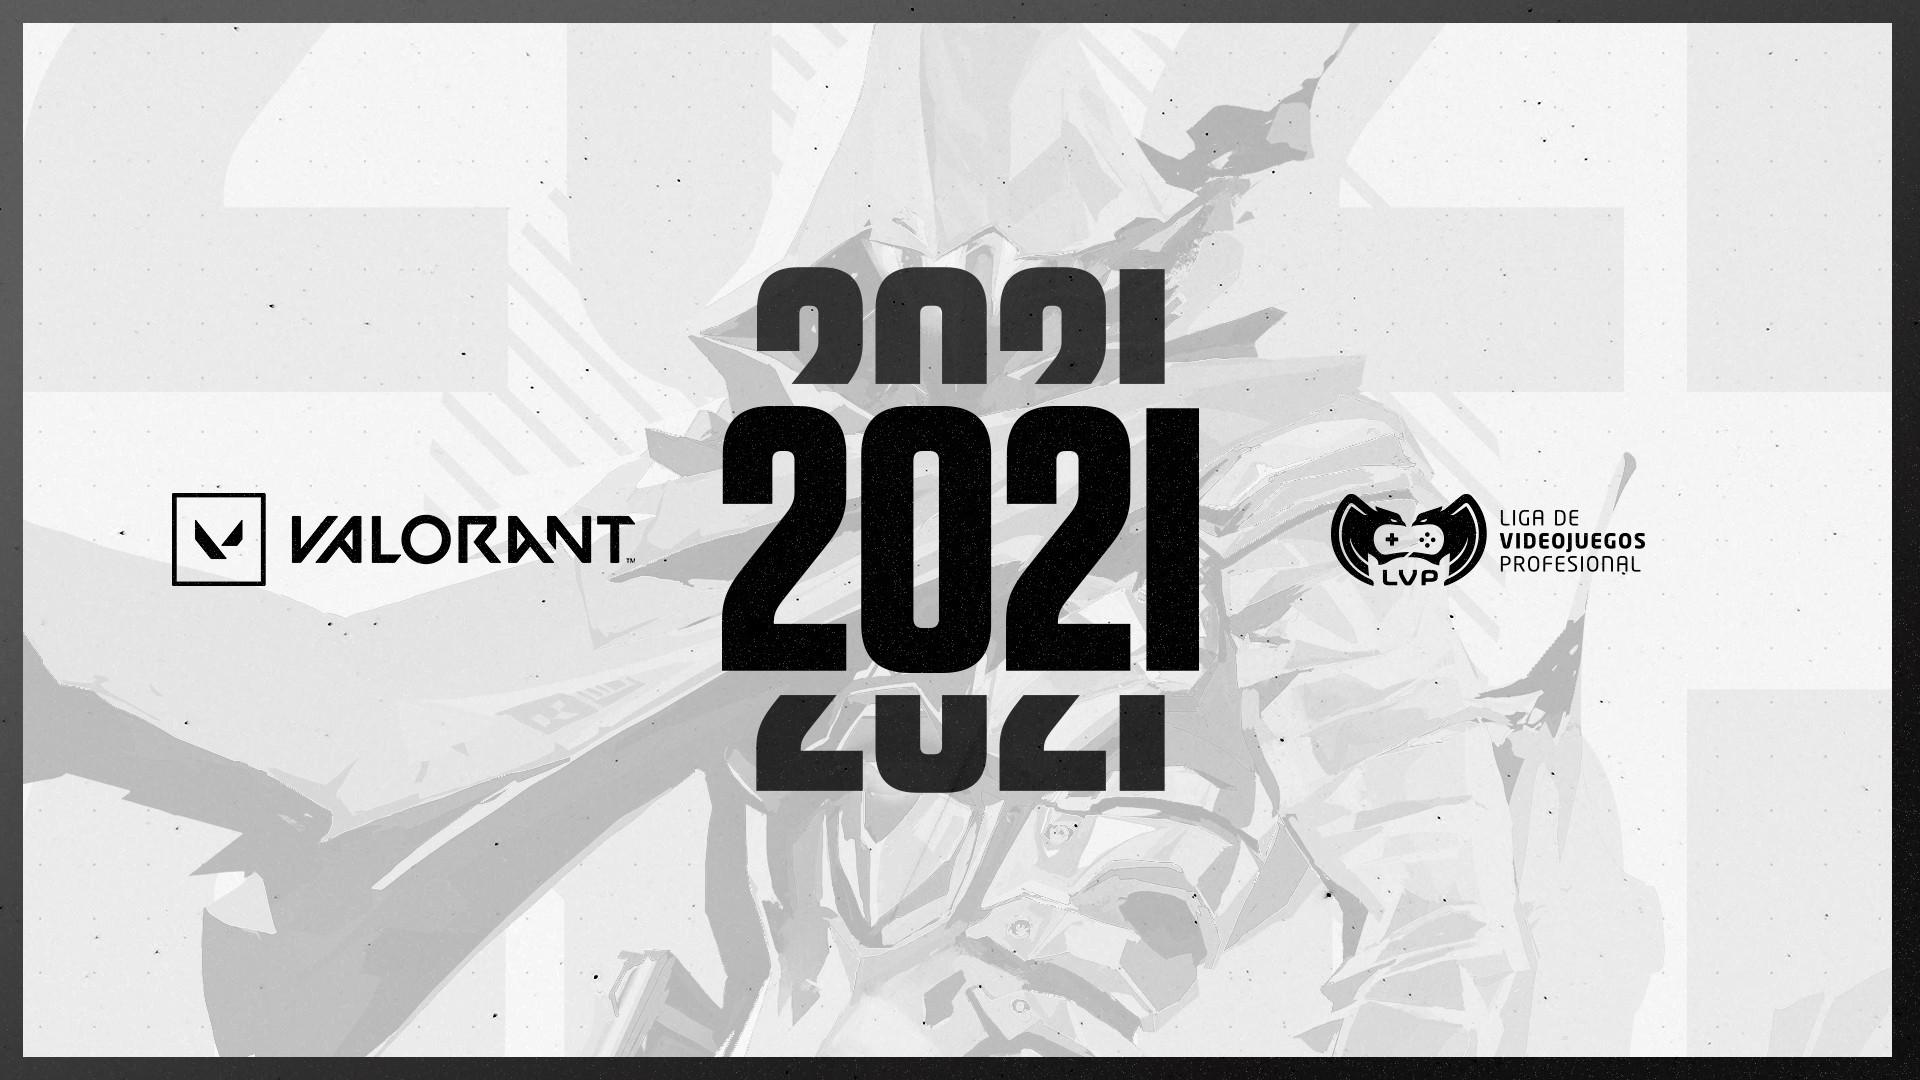 VALORANT-LVP-2021